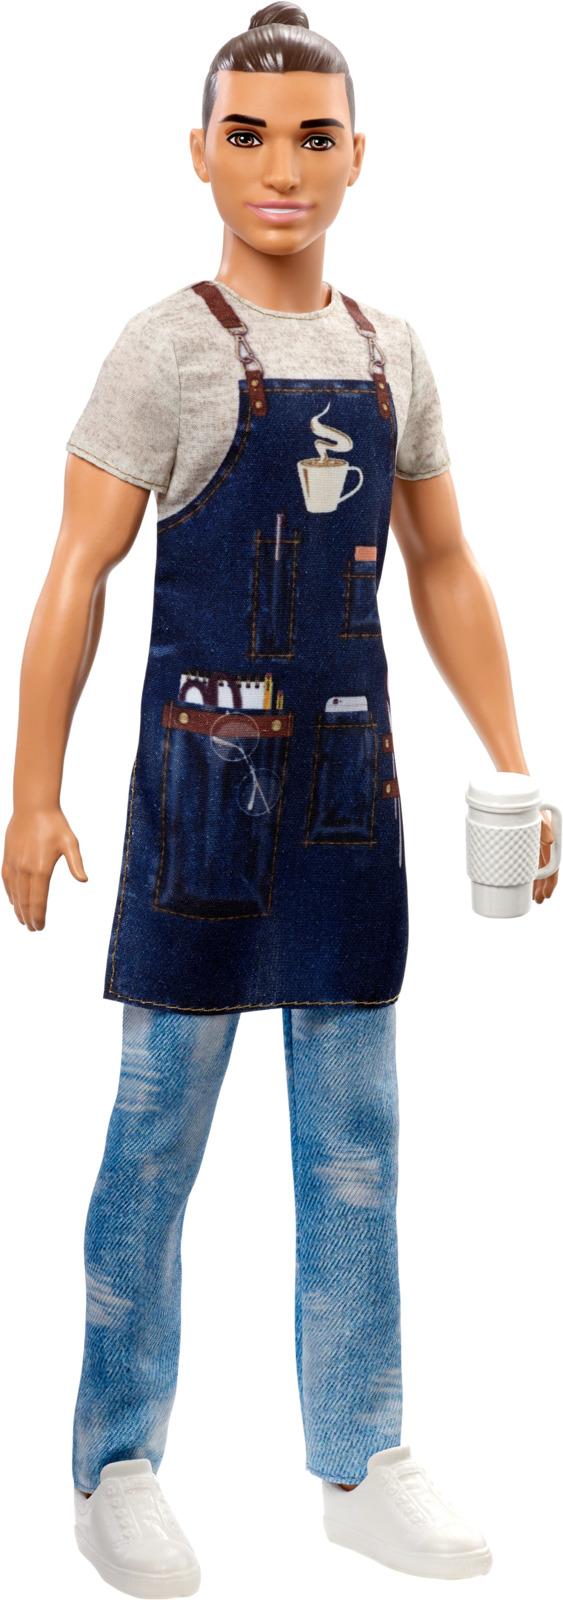 "Кукла Barbie ""Кем быть Кен"", FXP01_FXP03"